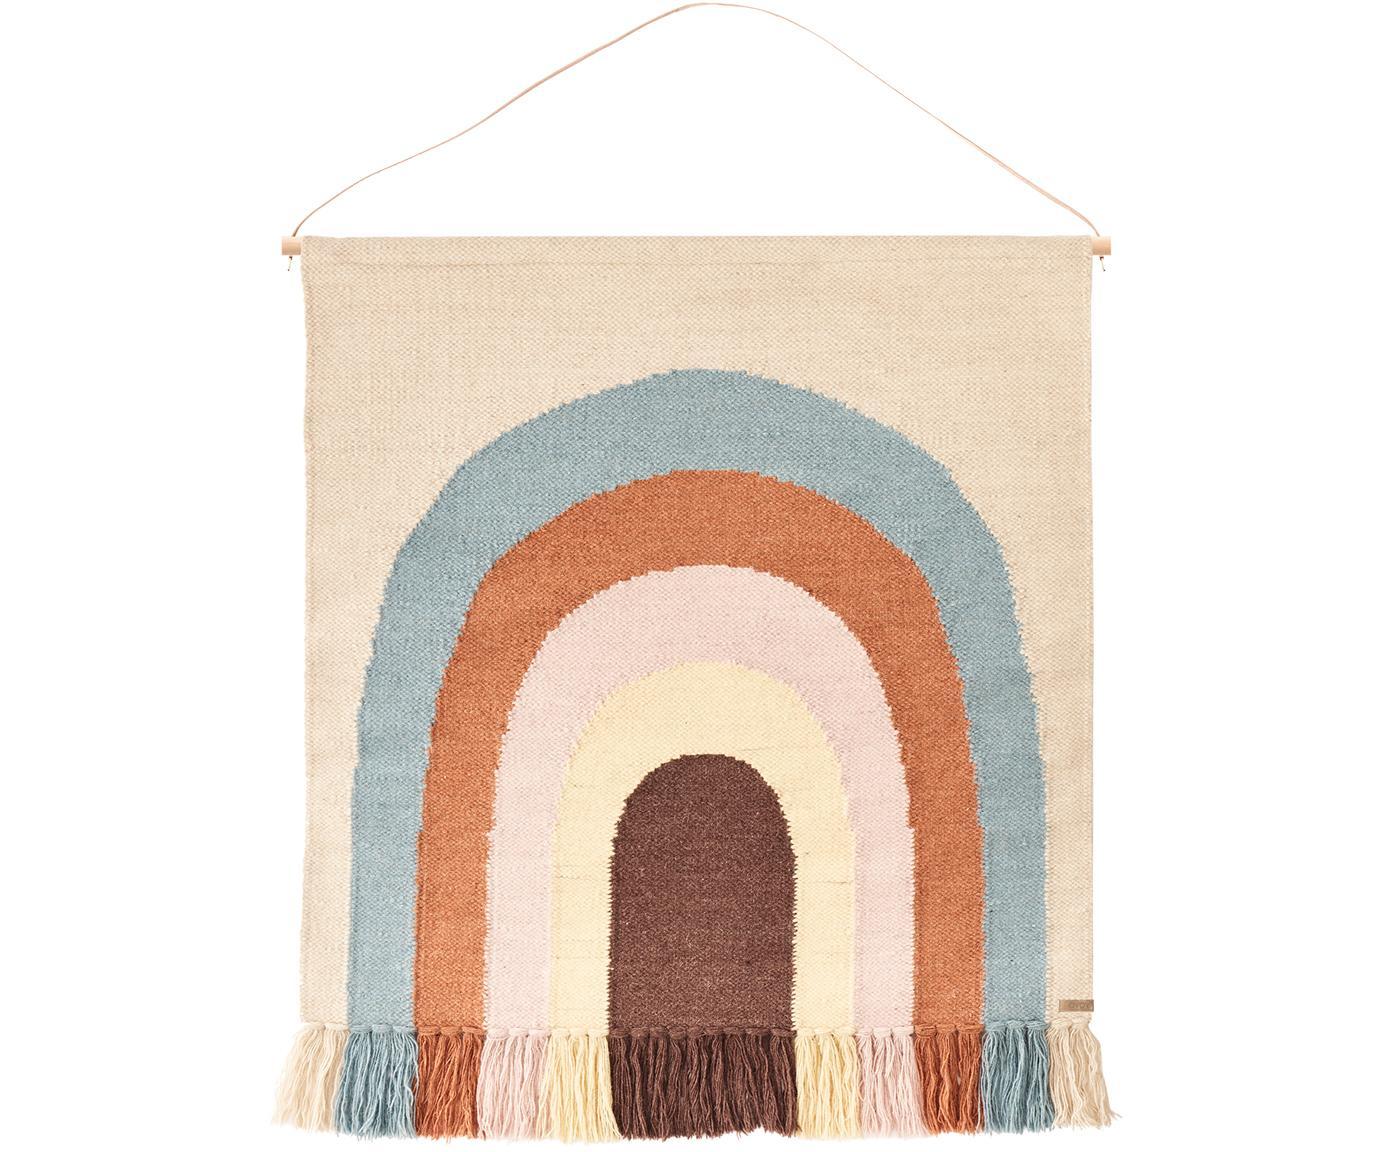 Grosses Wandobjekt Rainbow, 80% Wolle, 20% Baumwolle, Beige, Blau, Orange, Rosa, Creme, Altrosa, 100 x 115 cm